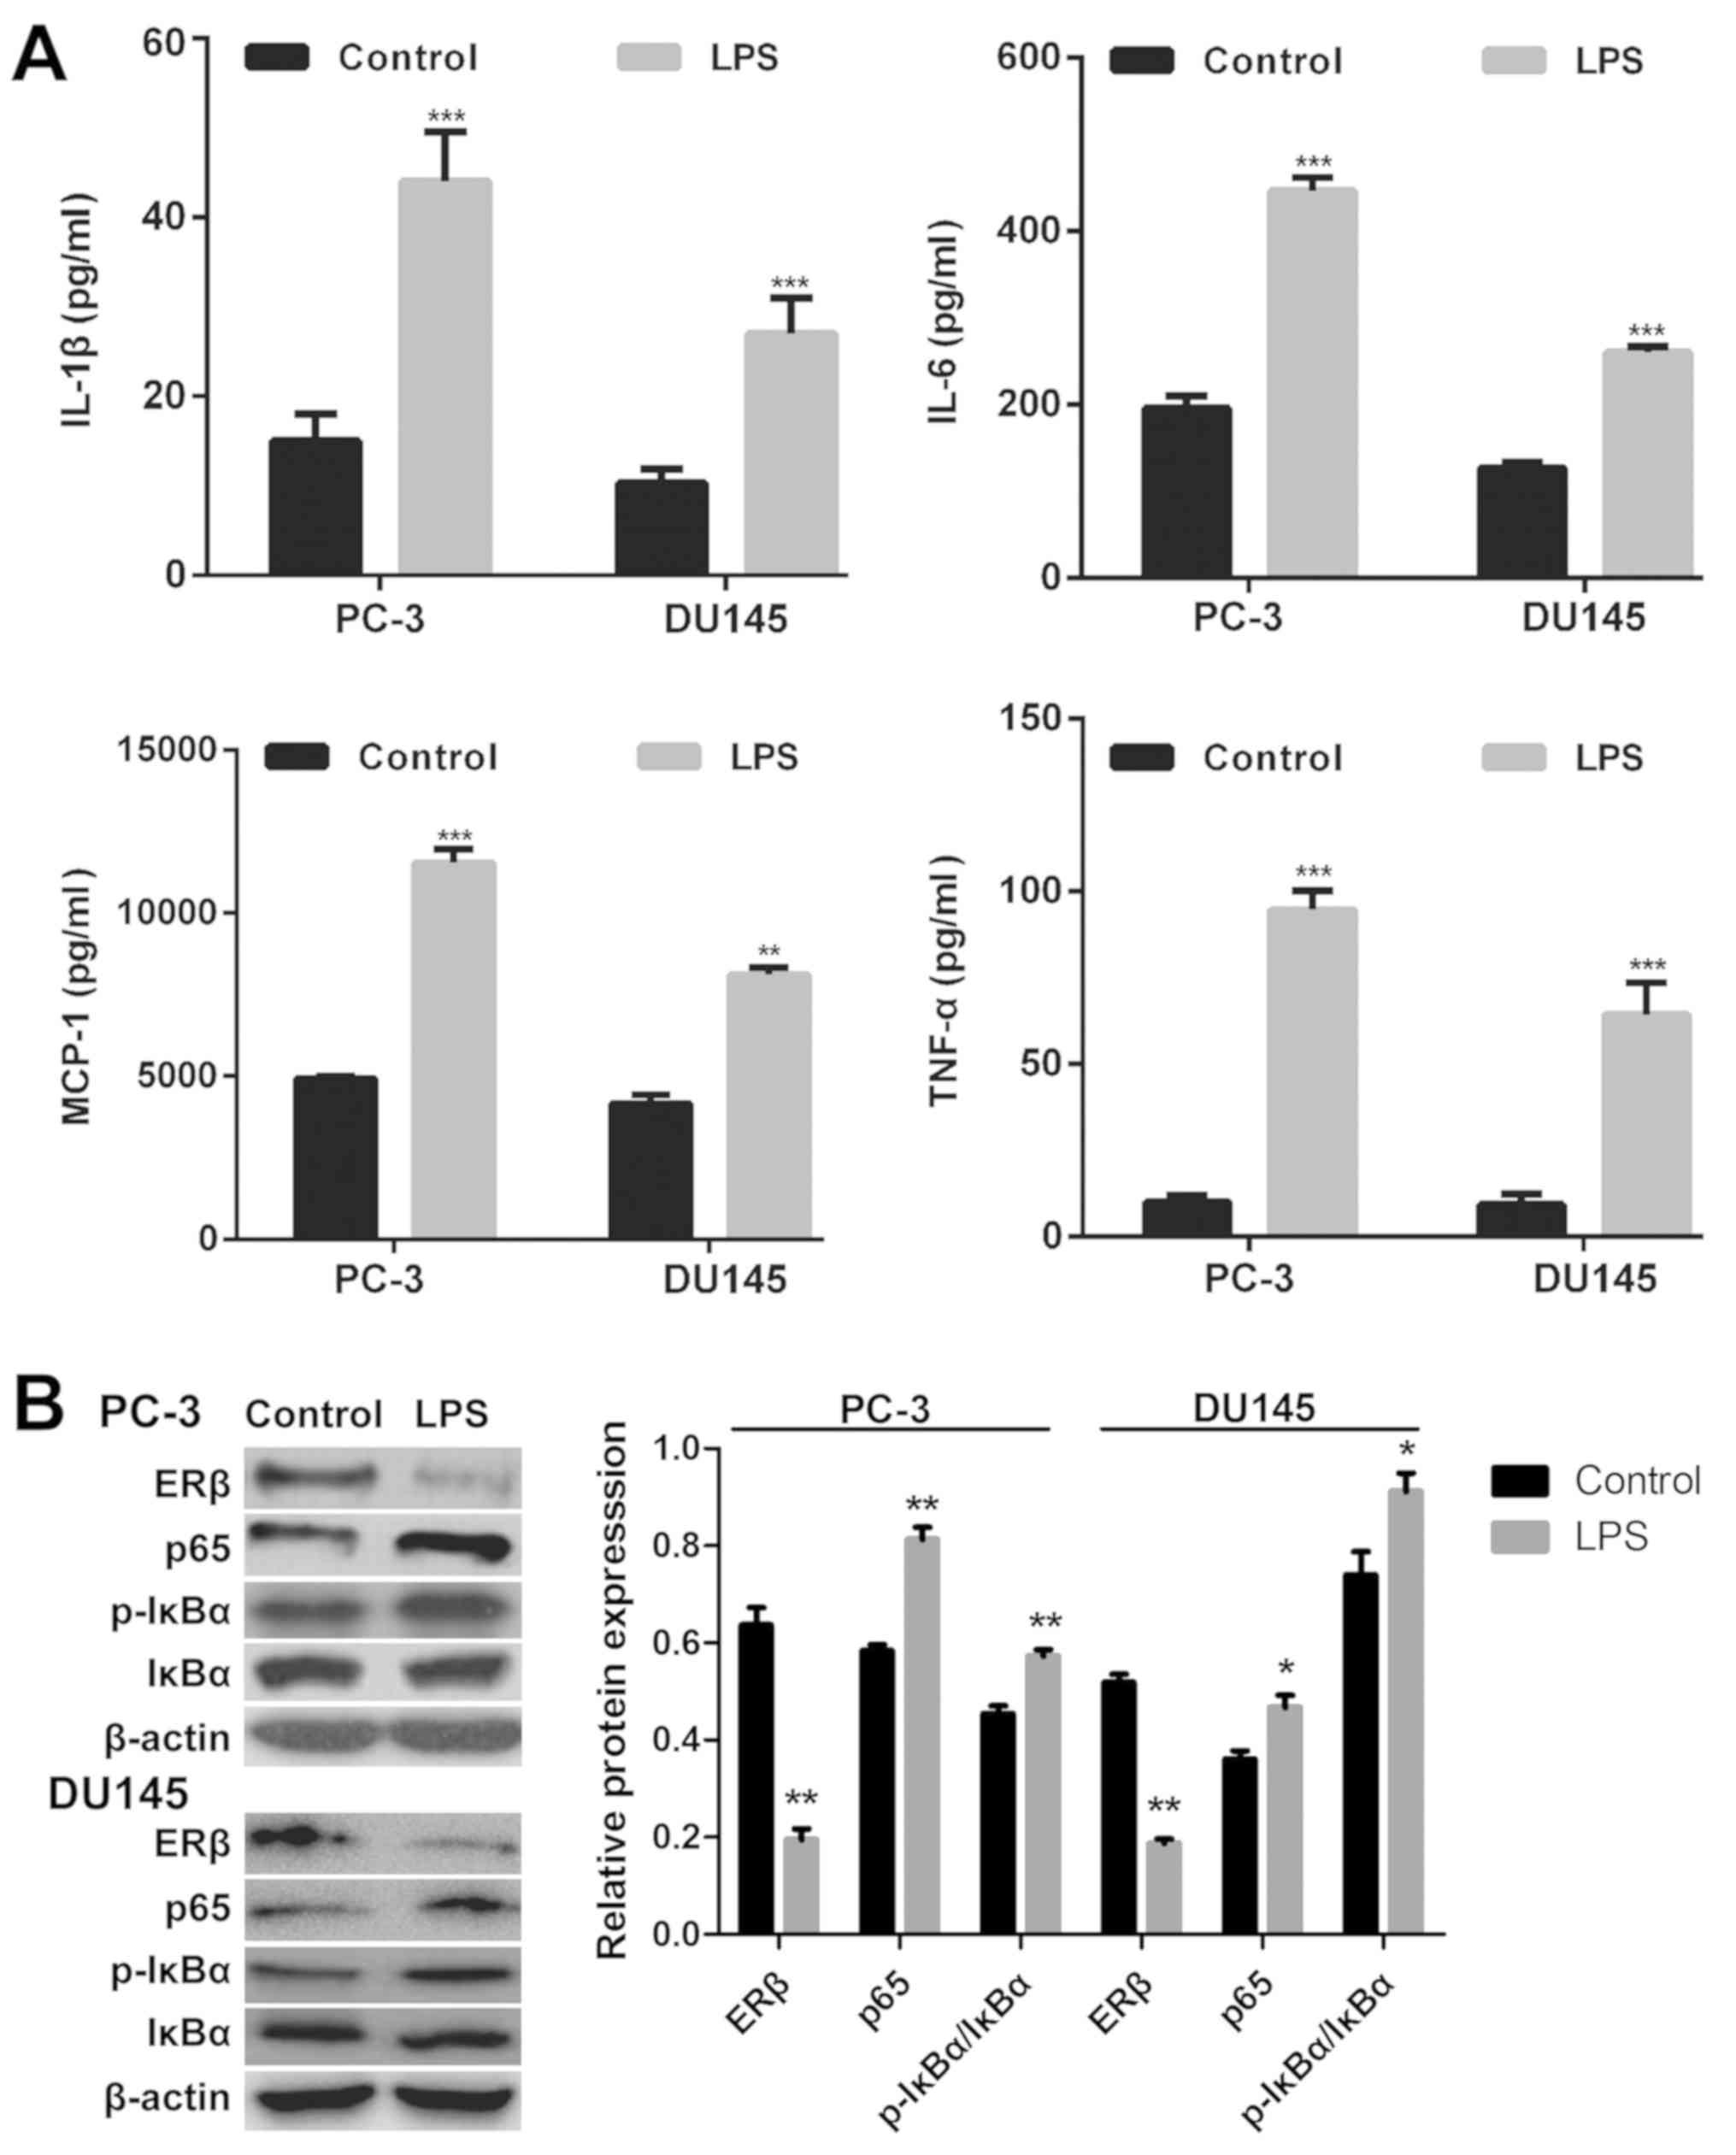 Estrogen receptor β suppresses inflammation and the